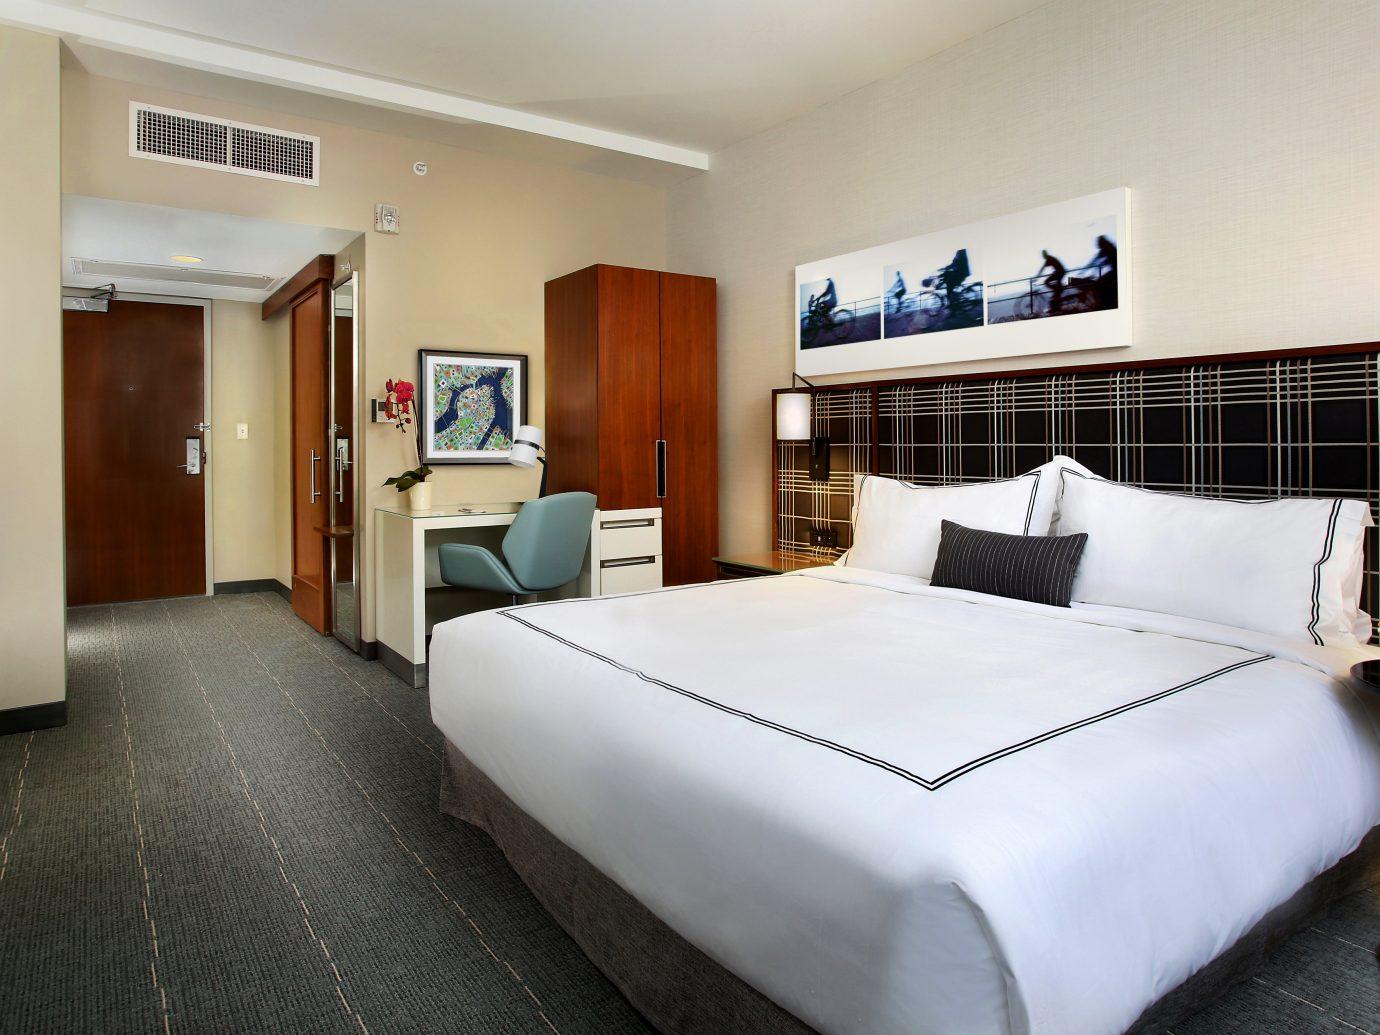 Bedroom Hotels Luxury Modern Suite indoor wall bed floor room ceiling property hotel estate real estate cottage interior design condominium apartment furniture